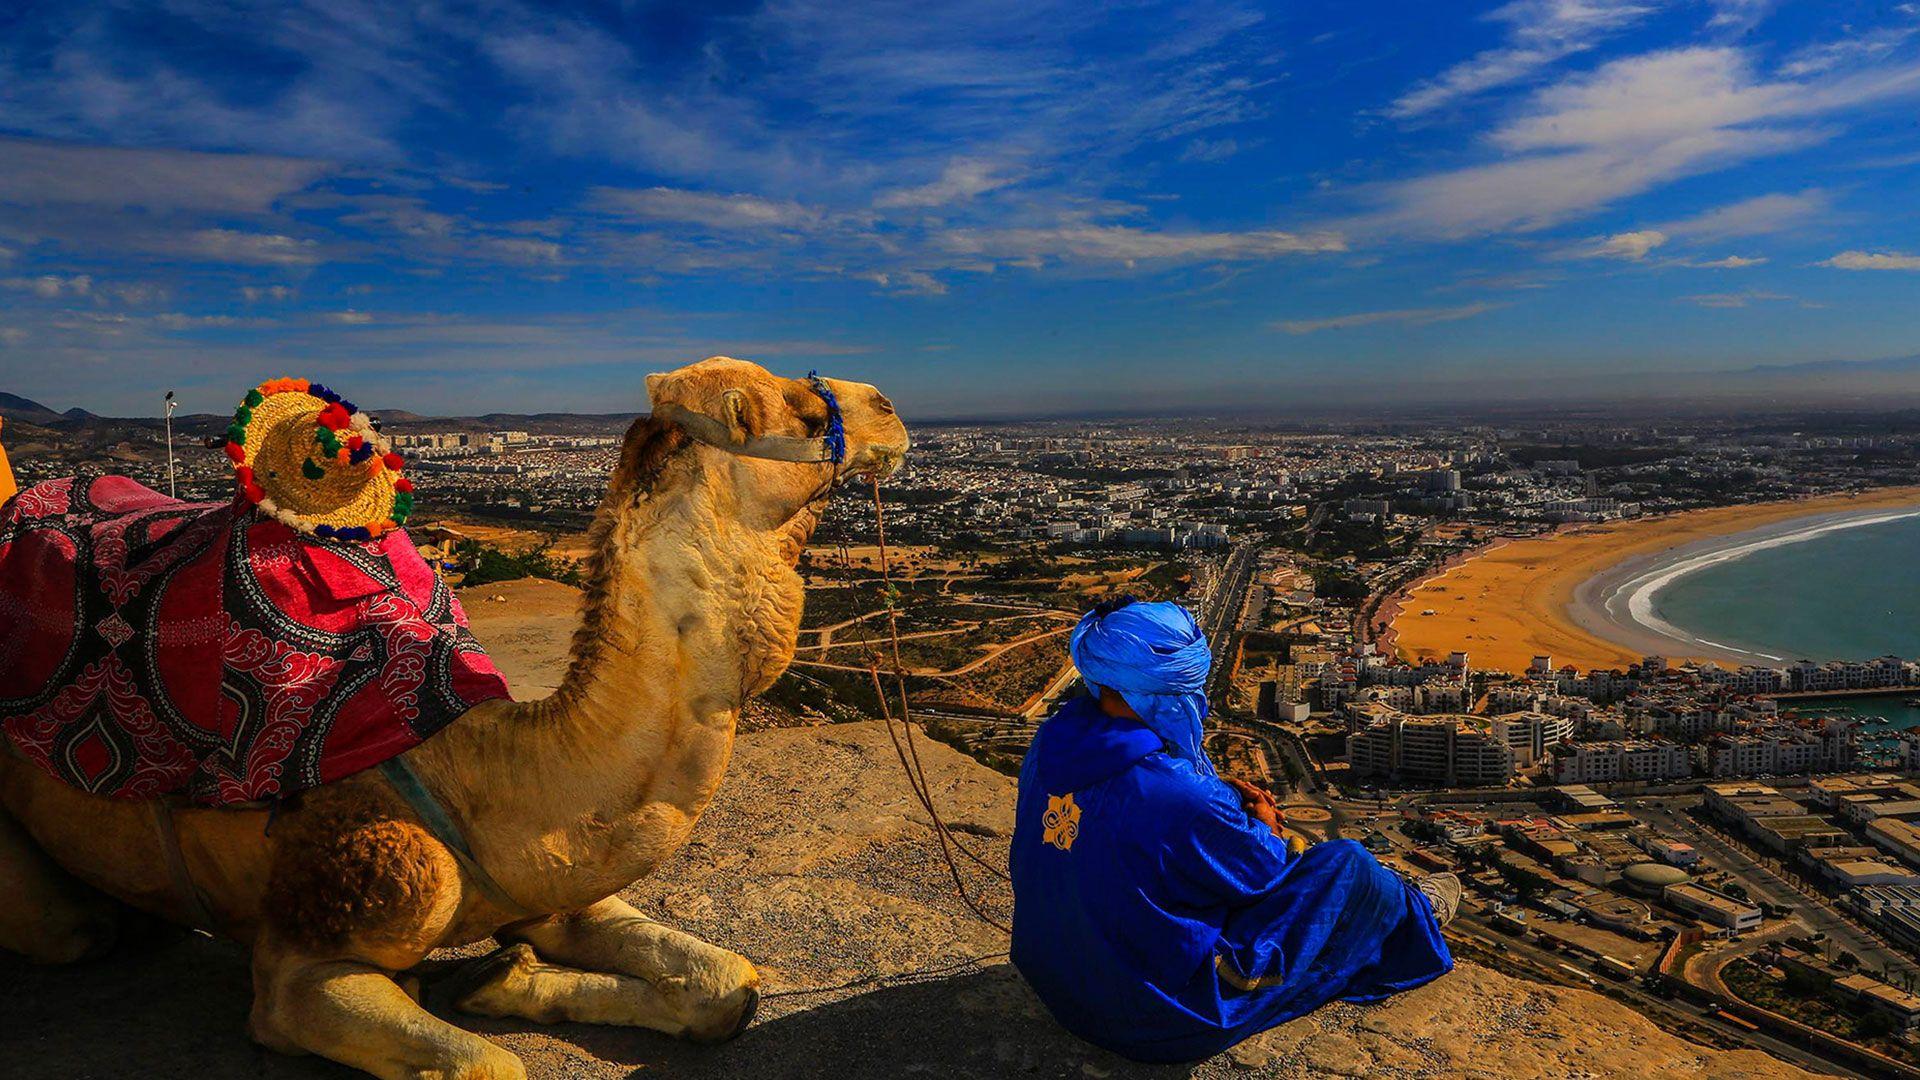 mejor epoca para viajar a marruecos